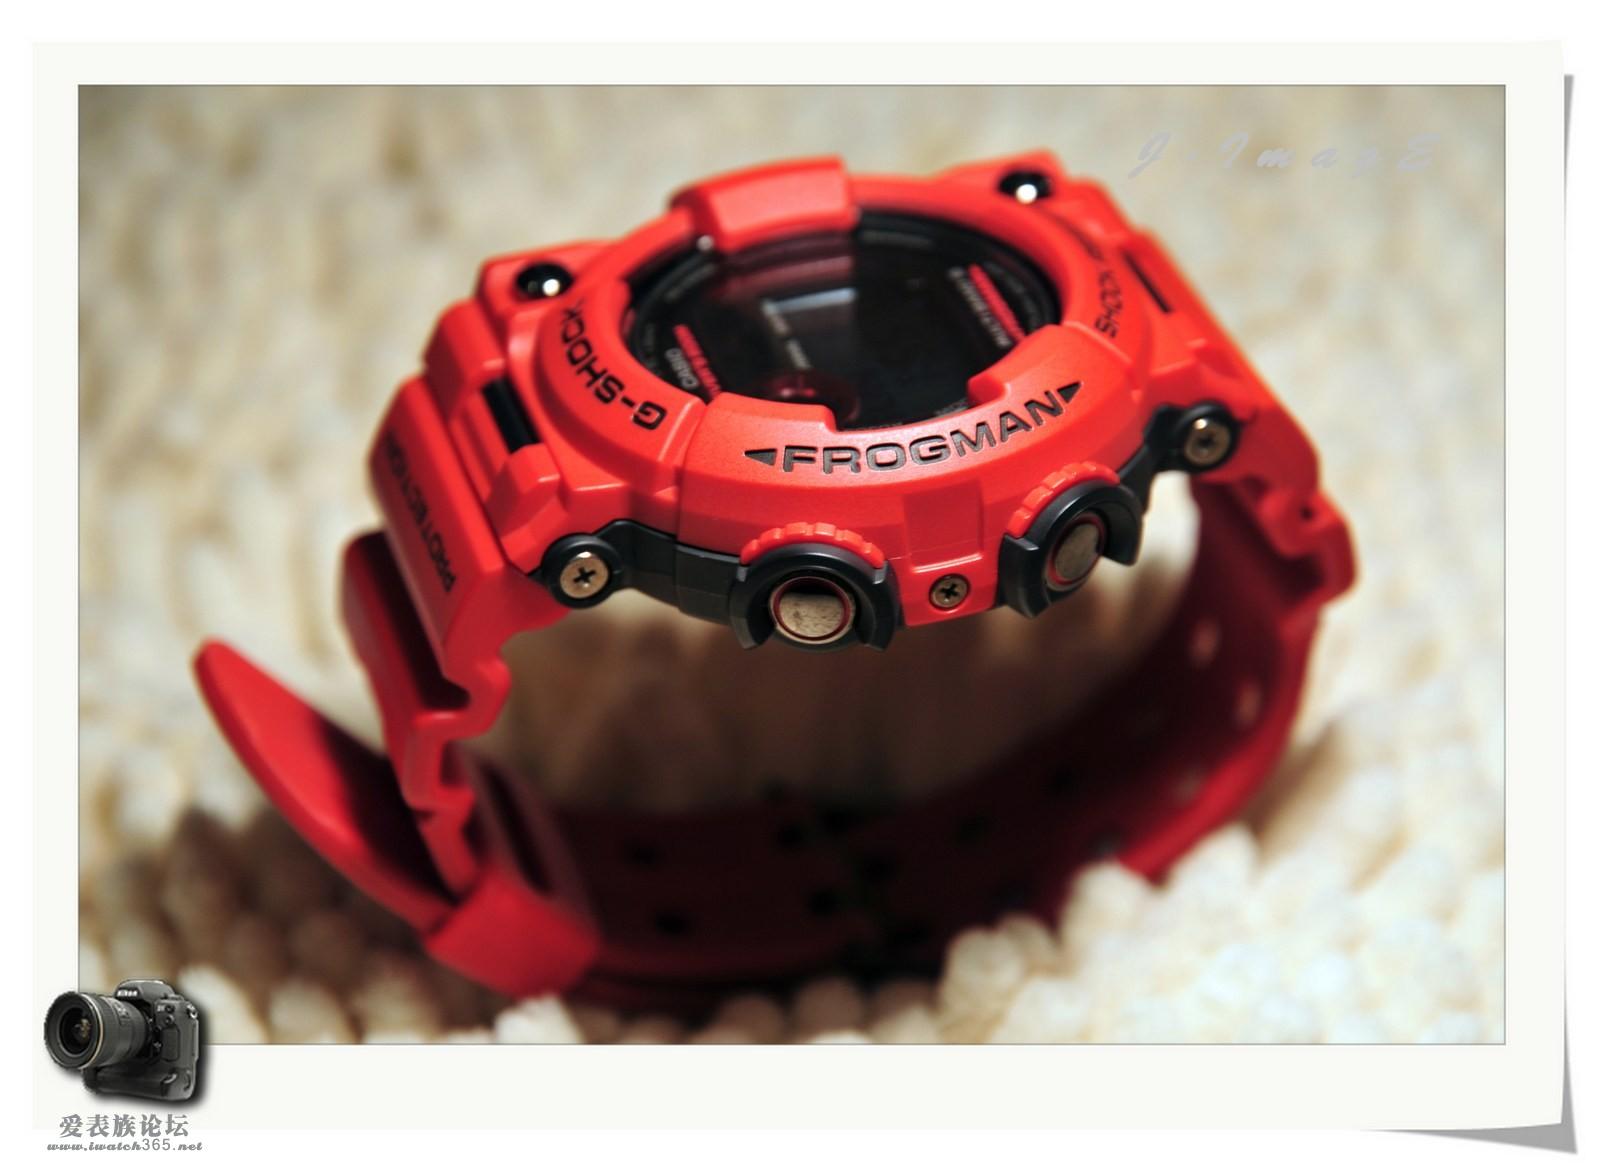 casio卡西欧g-shock系列gwf-1000rd-4jf手表图片